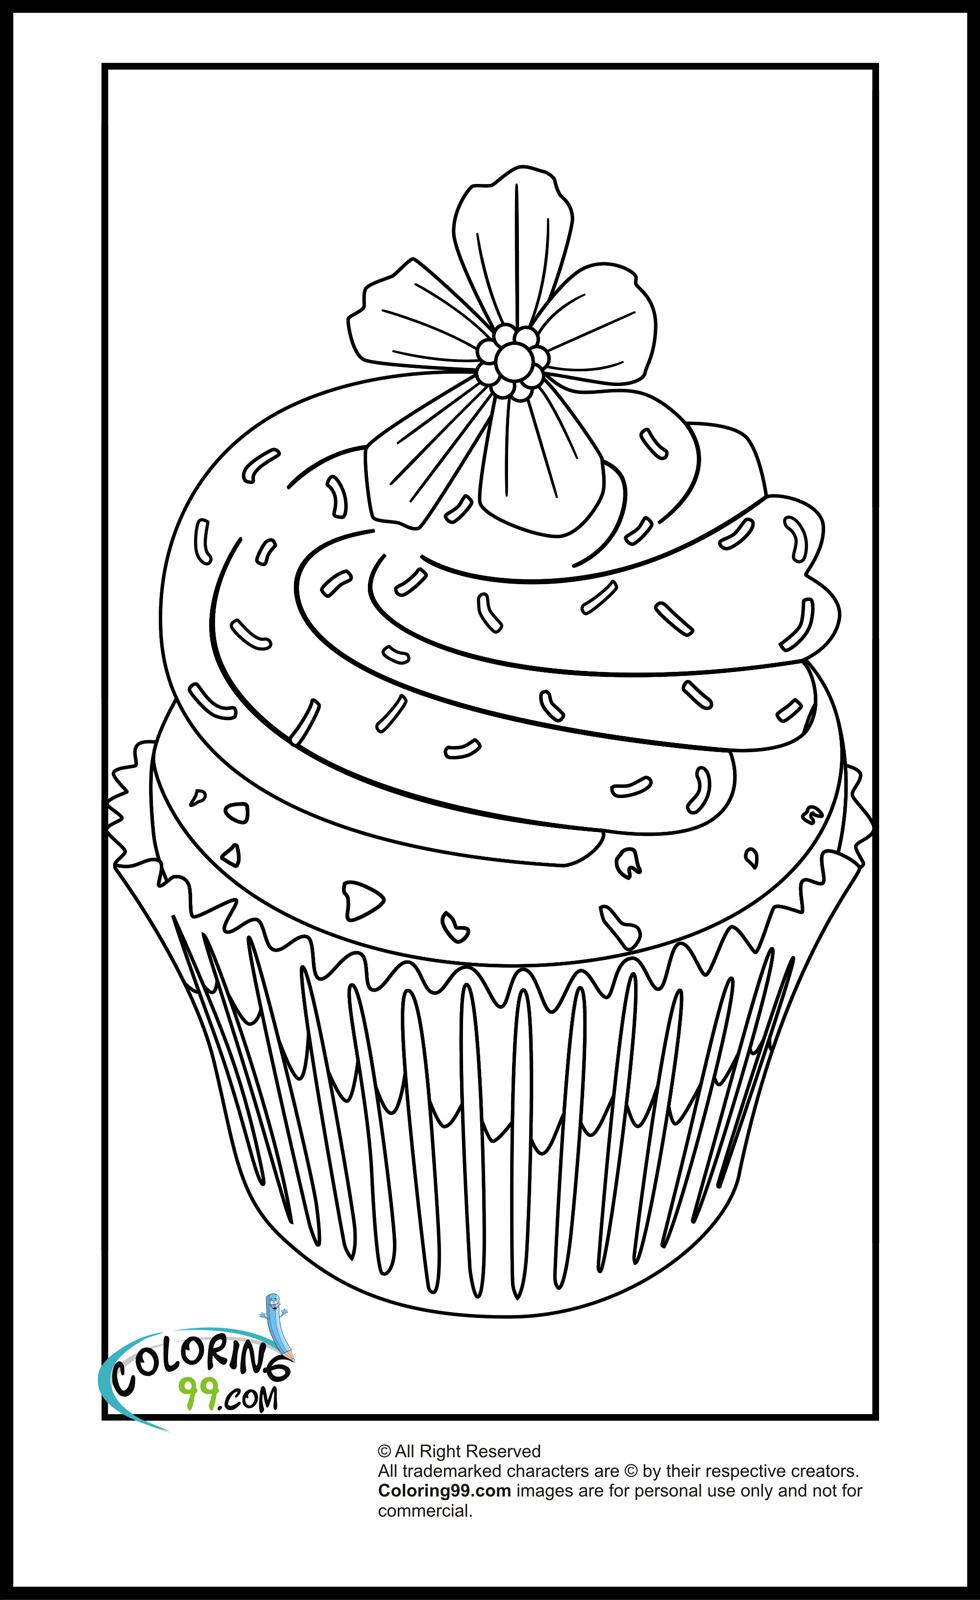 cupcakes coloring pages cupcake coloring pages minister coloring cupcakes coloring pages 1 1